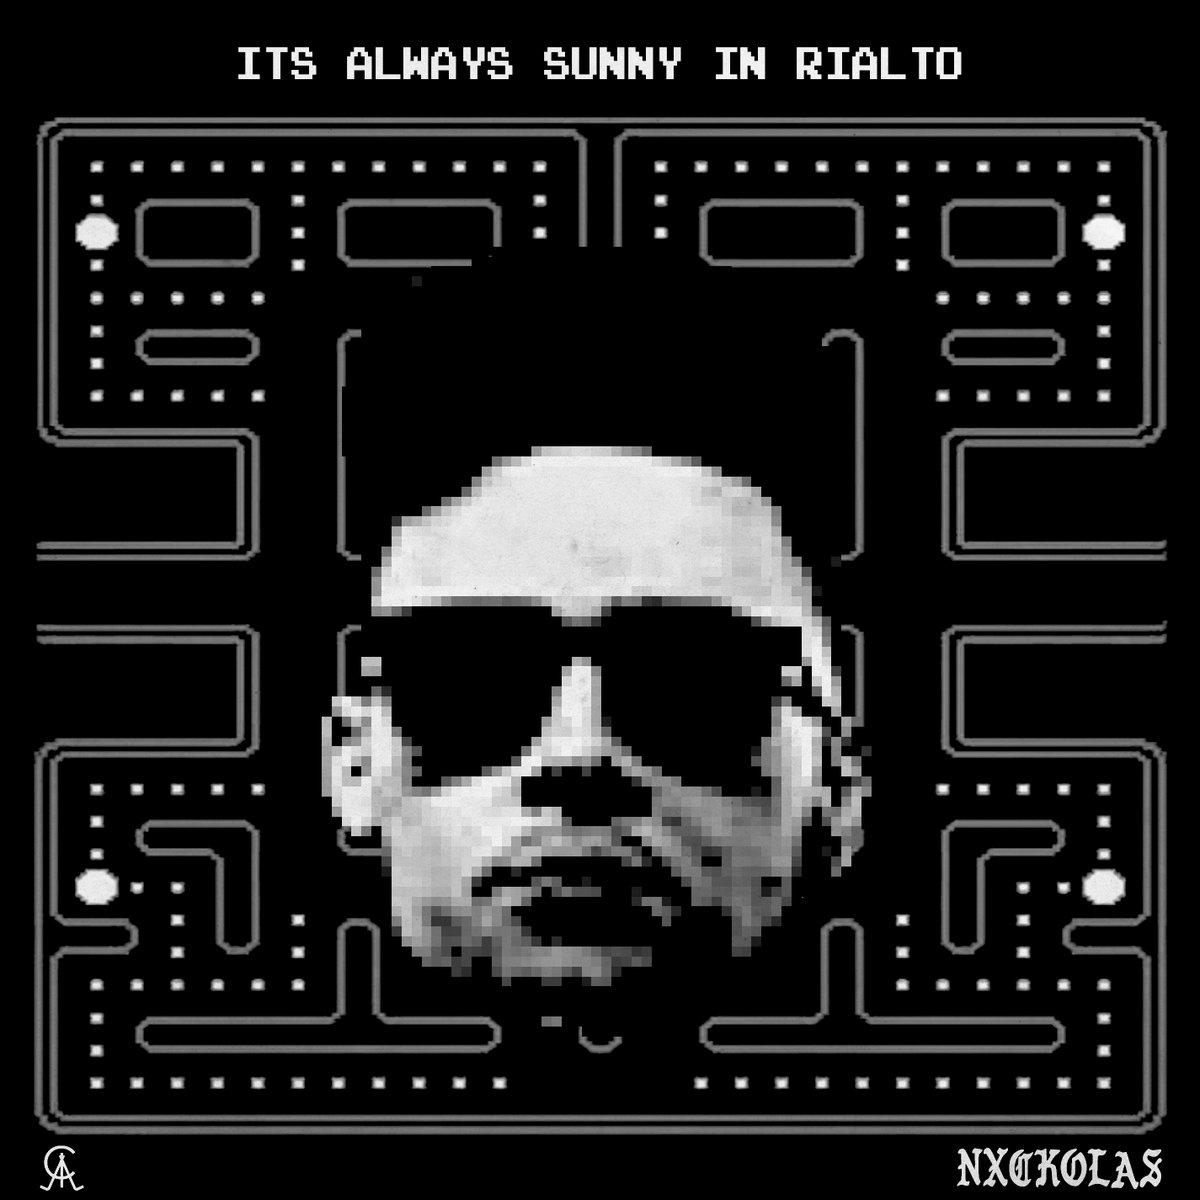 NXCKOLAS - IT'S ALWAYS SUNNY IN RIALTO